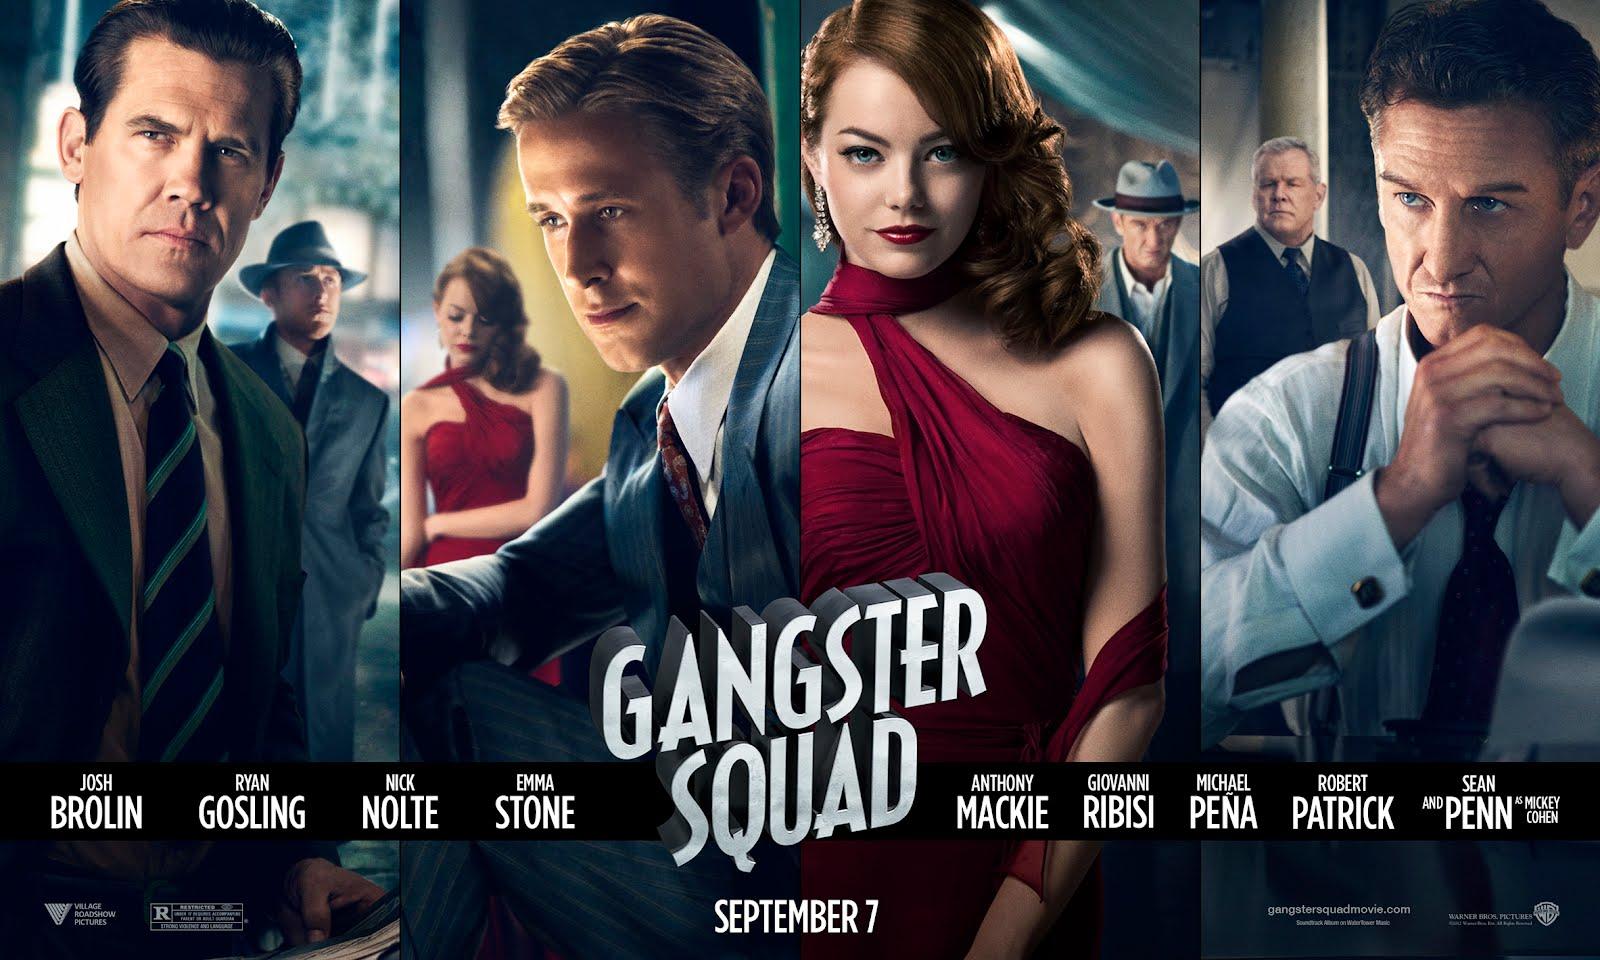 http://1.bp.blogspot.com/-vHWlXc1Fucg/UAX8dDp1j5I/AAAAAAAAAFU/HDK6EwA9ktU/s1600/gangster-squad-poster-banner-poster.jpg